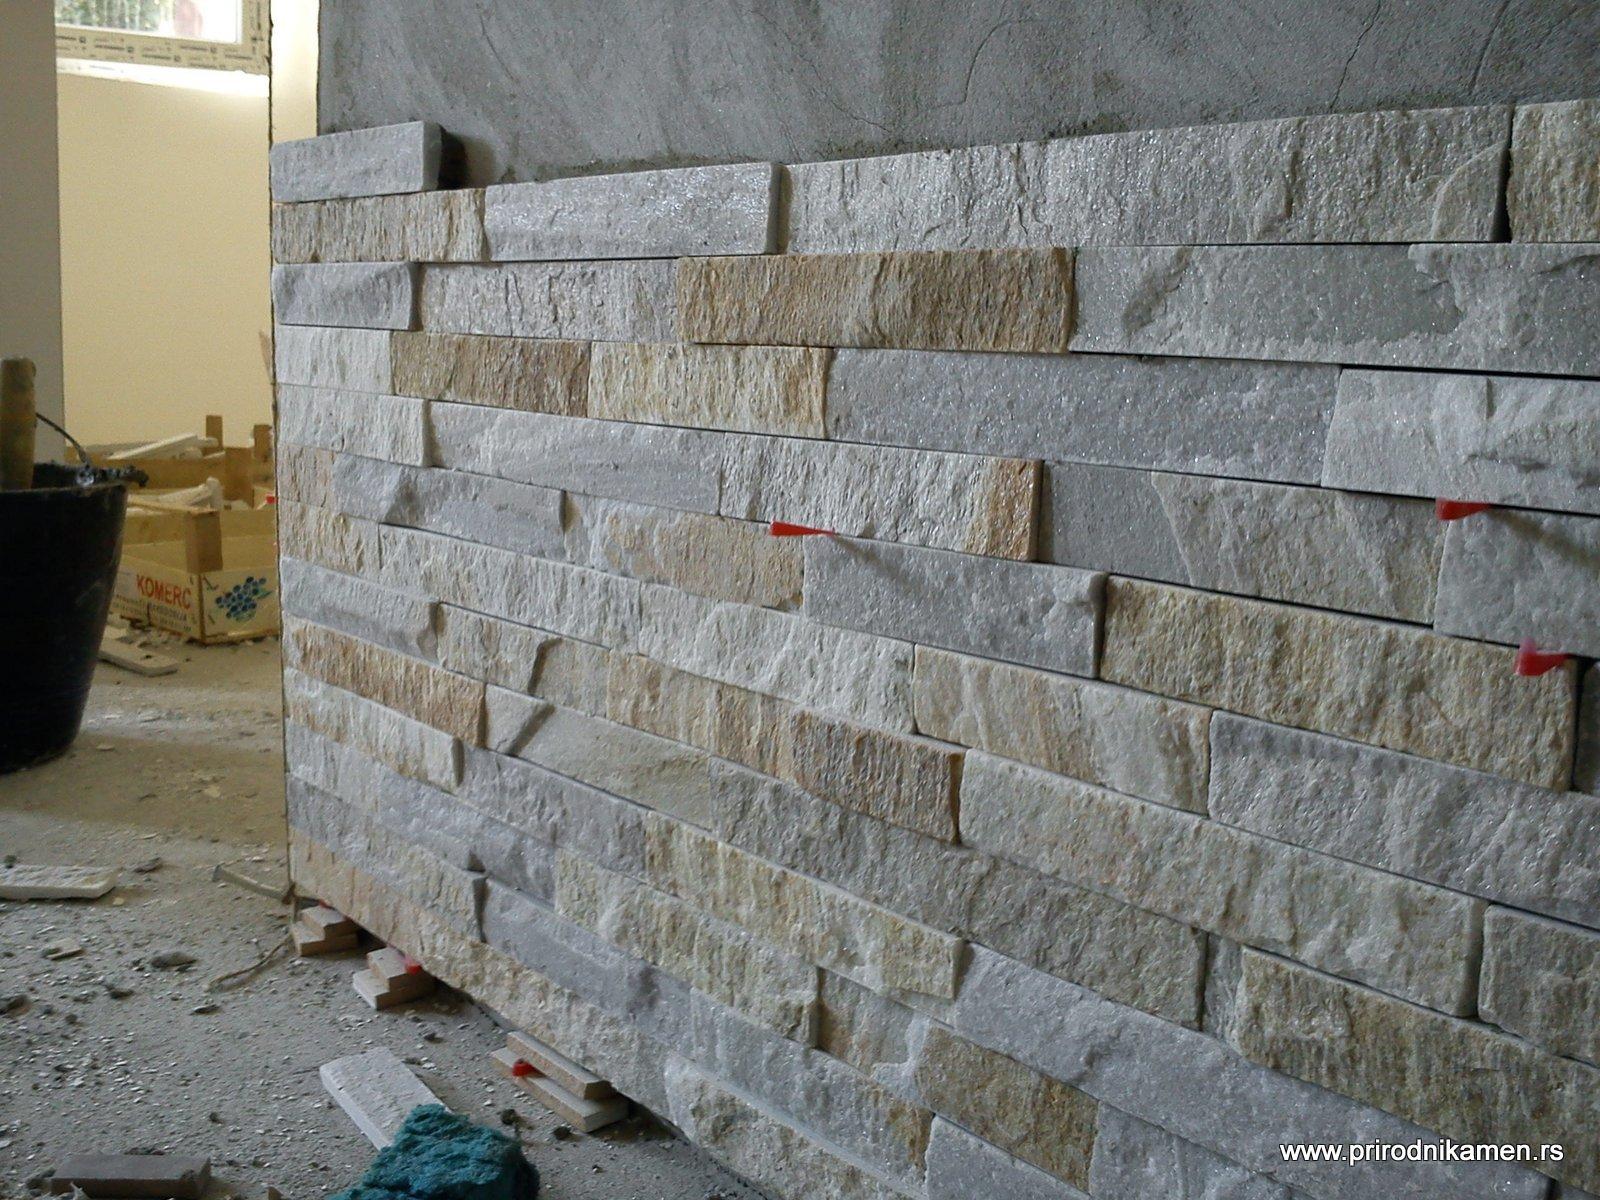 Ugradnja prirodni kamen-gerovane ivice (13)